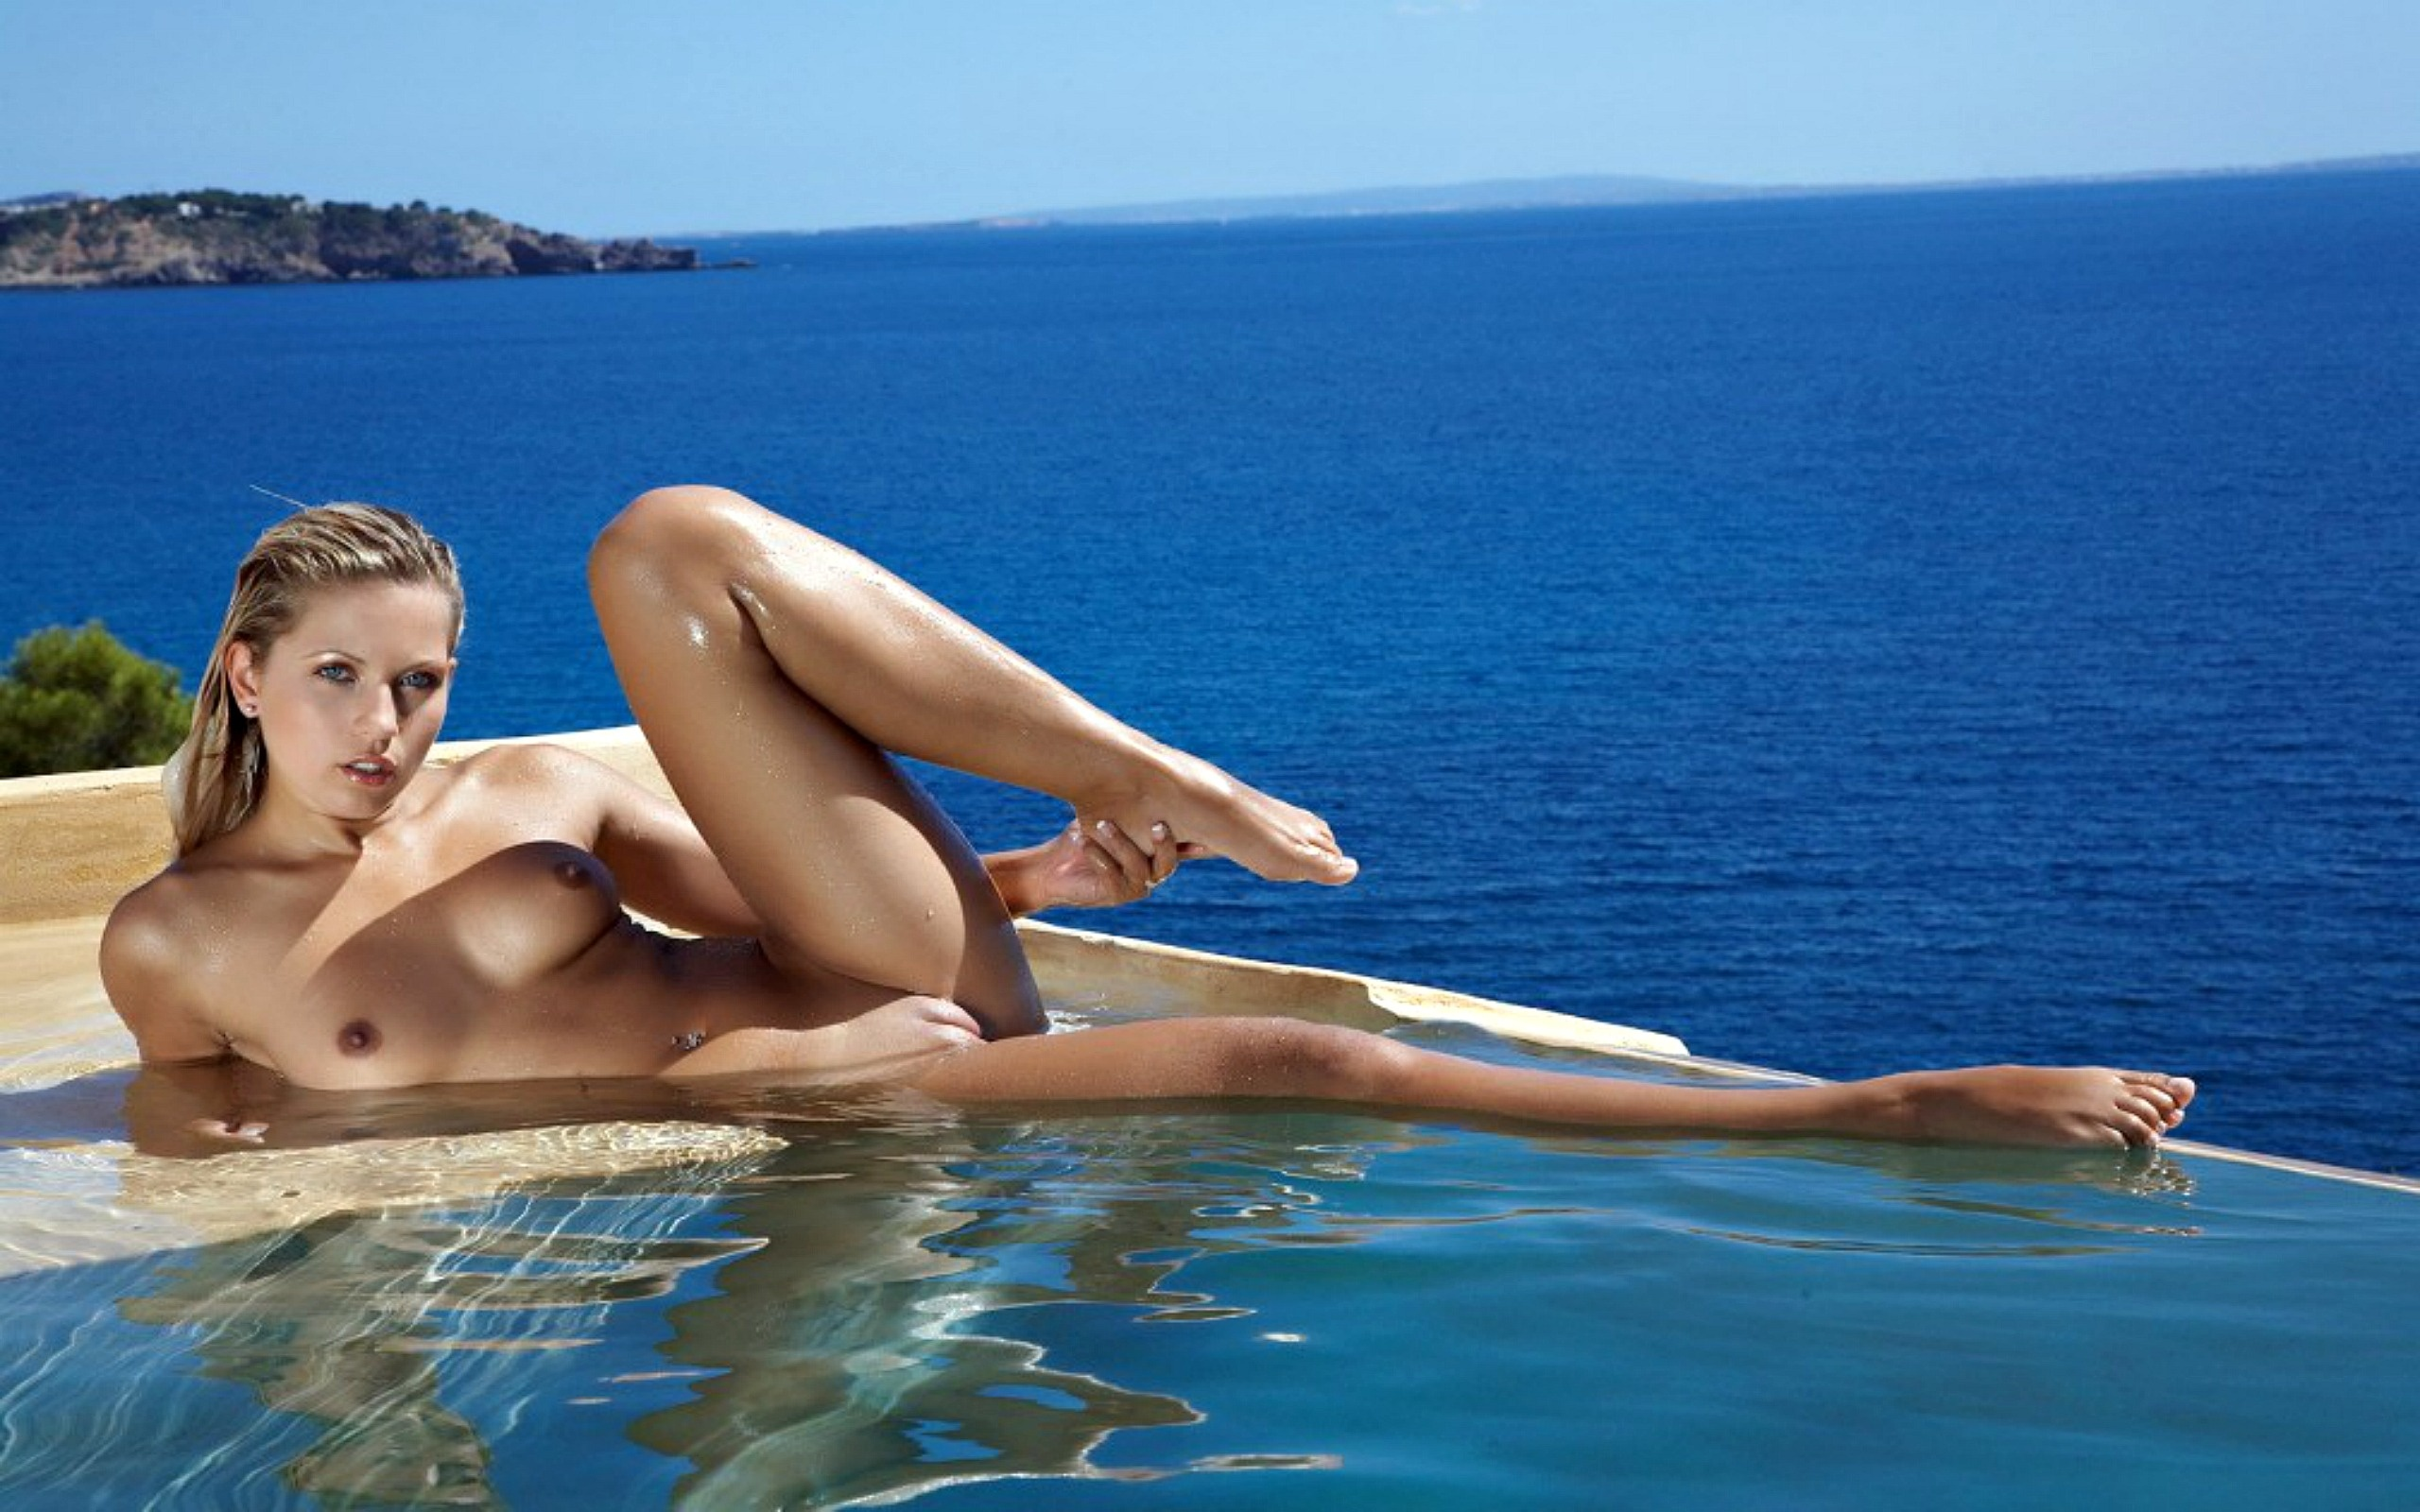 sexy internation girls in nude